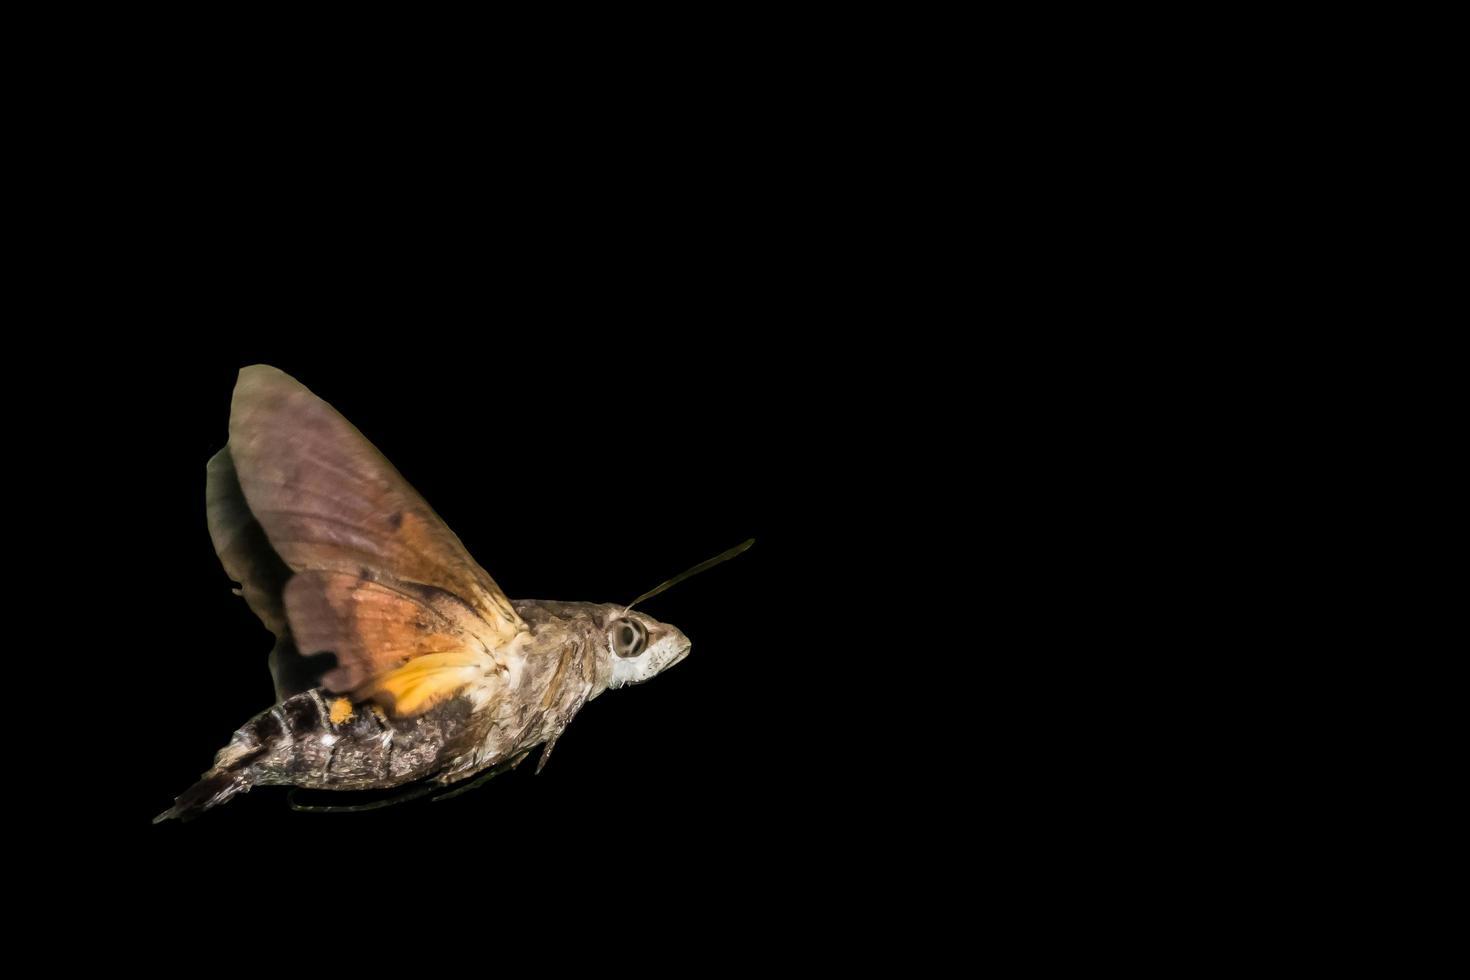 mariposa em fundo preto foto